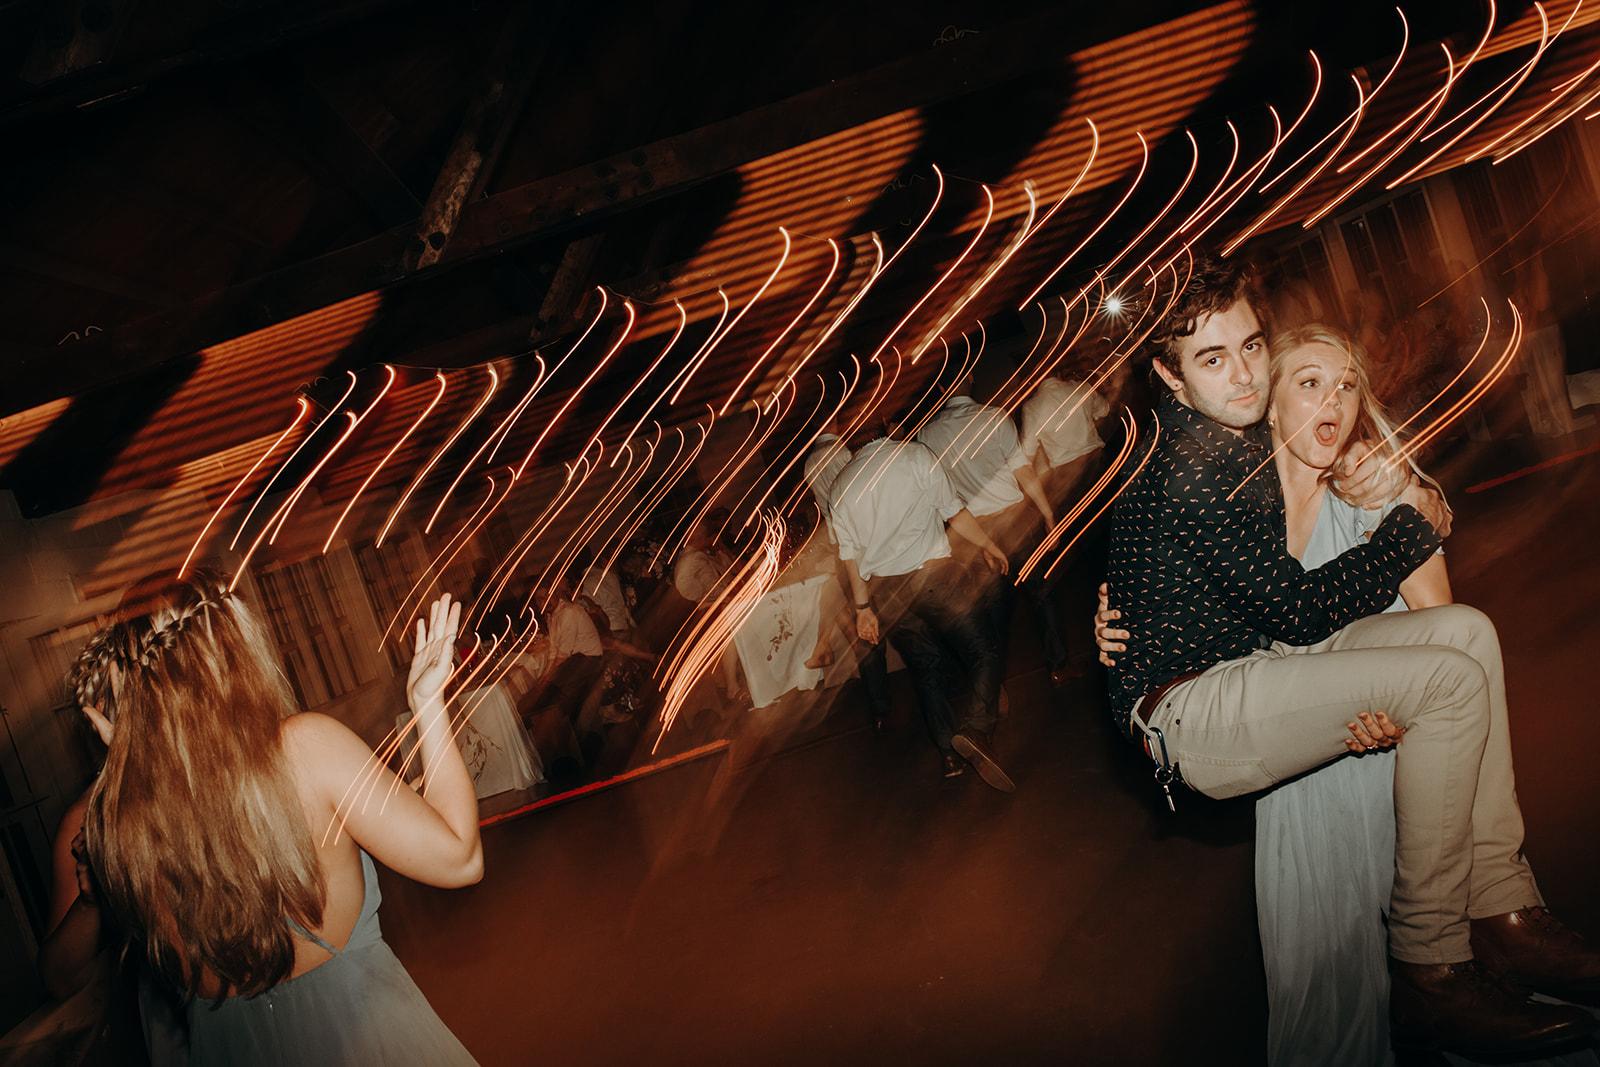 camp_wokanda_peoria_illinois_wedding_photographer_wright_photographs_bliese_1000.jpg